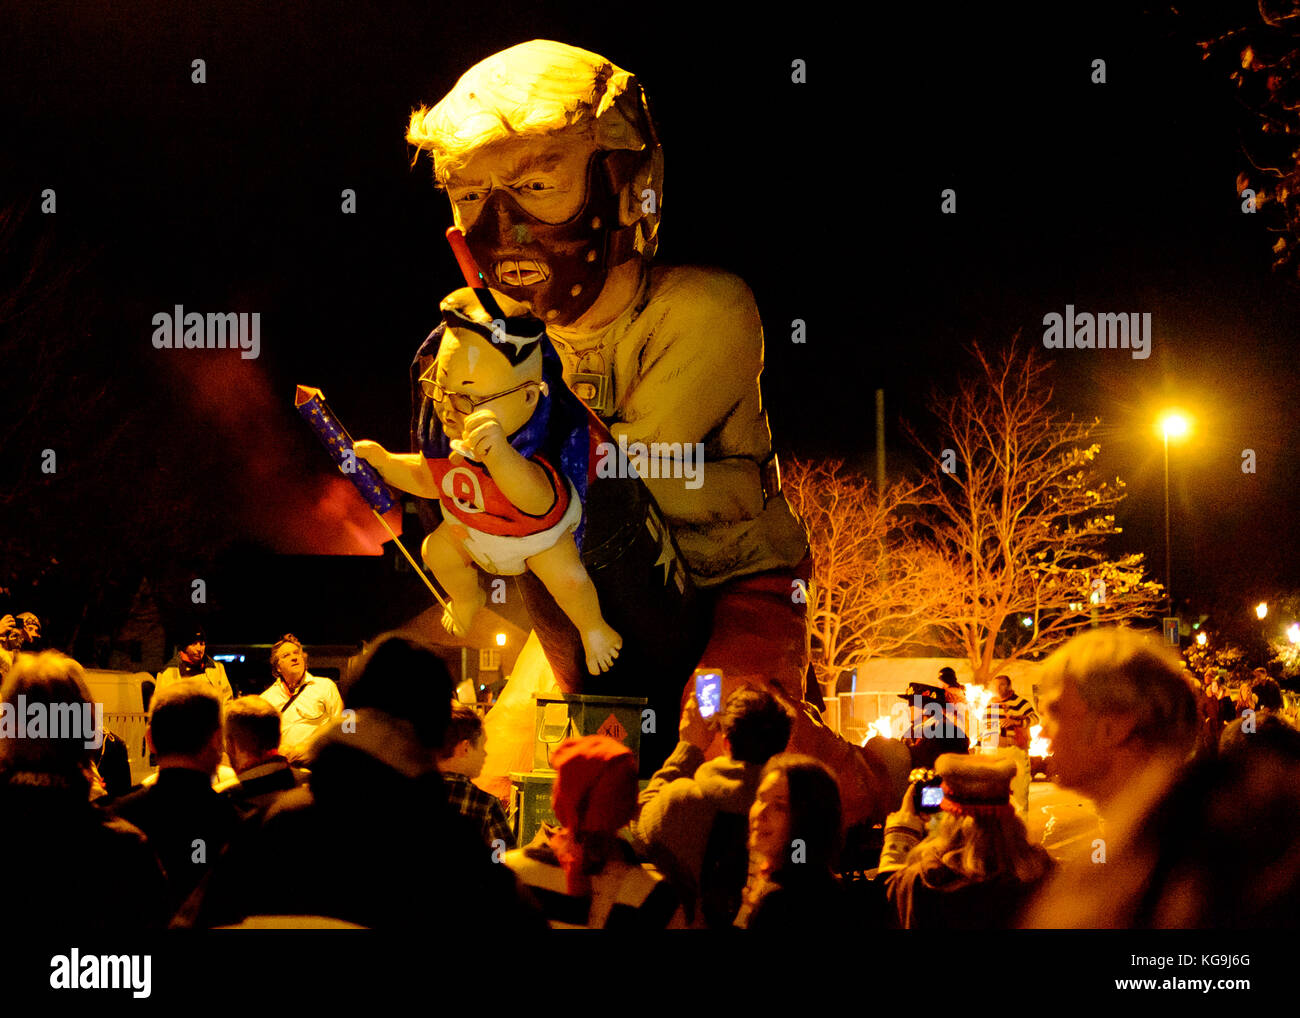 Lewes, UK. 4th Nov, 2017. Effigy of Donald Trump with 'Little Rocket Man' Kim Jong-un at Lewes Bonfire night - Stock Image